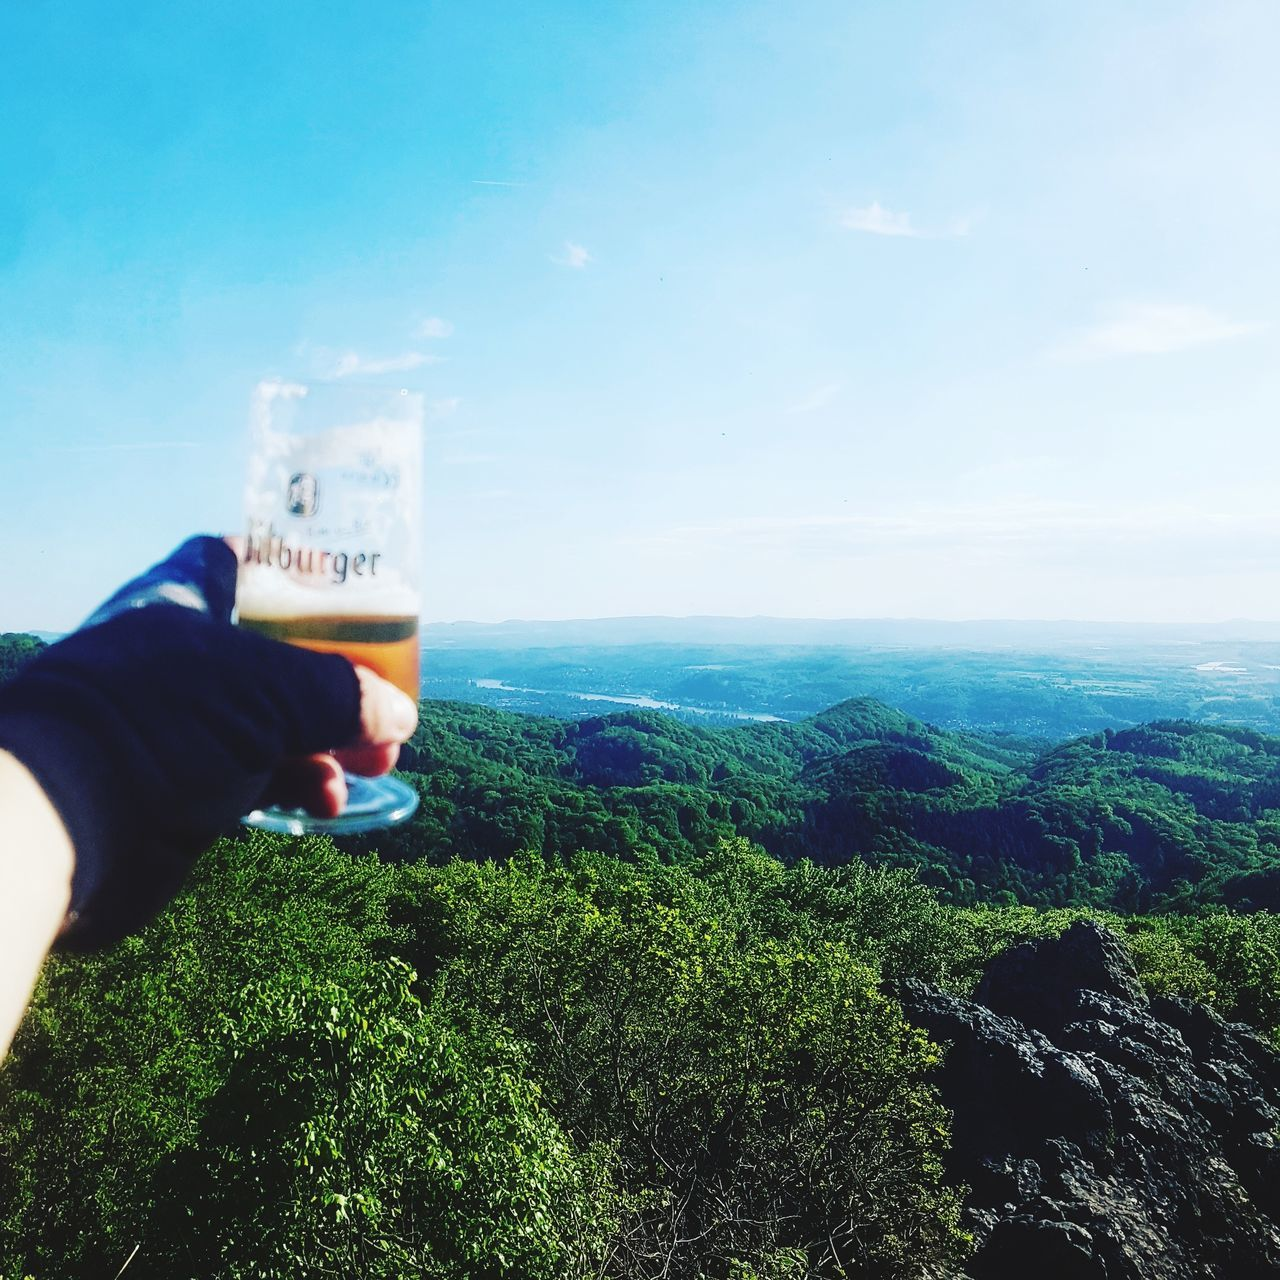 One Person Men Sky Nature Day Drinking Glass People Drink Only Men Human Hand GoPro Hero3+ MTB Biking Ausflug  Sport Nature Gopro MTB Fahrrad Adventure Mountain Built Structure Biking No People Wald Beer